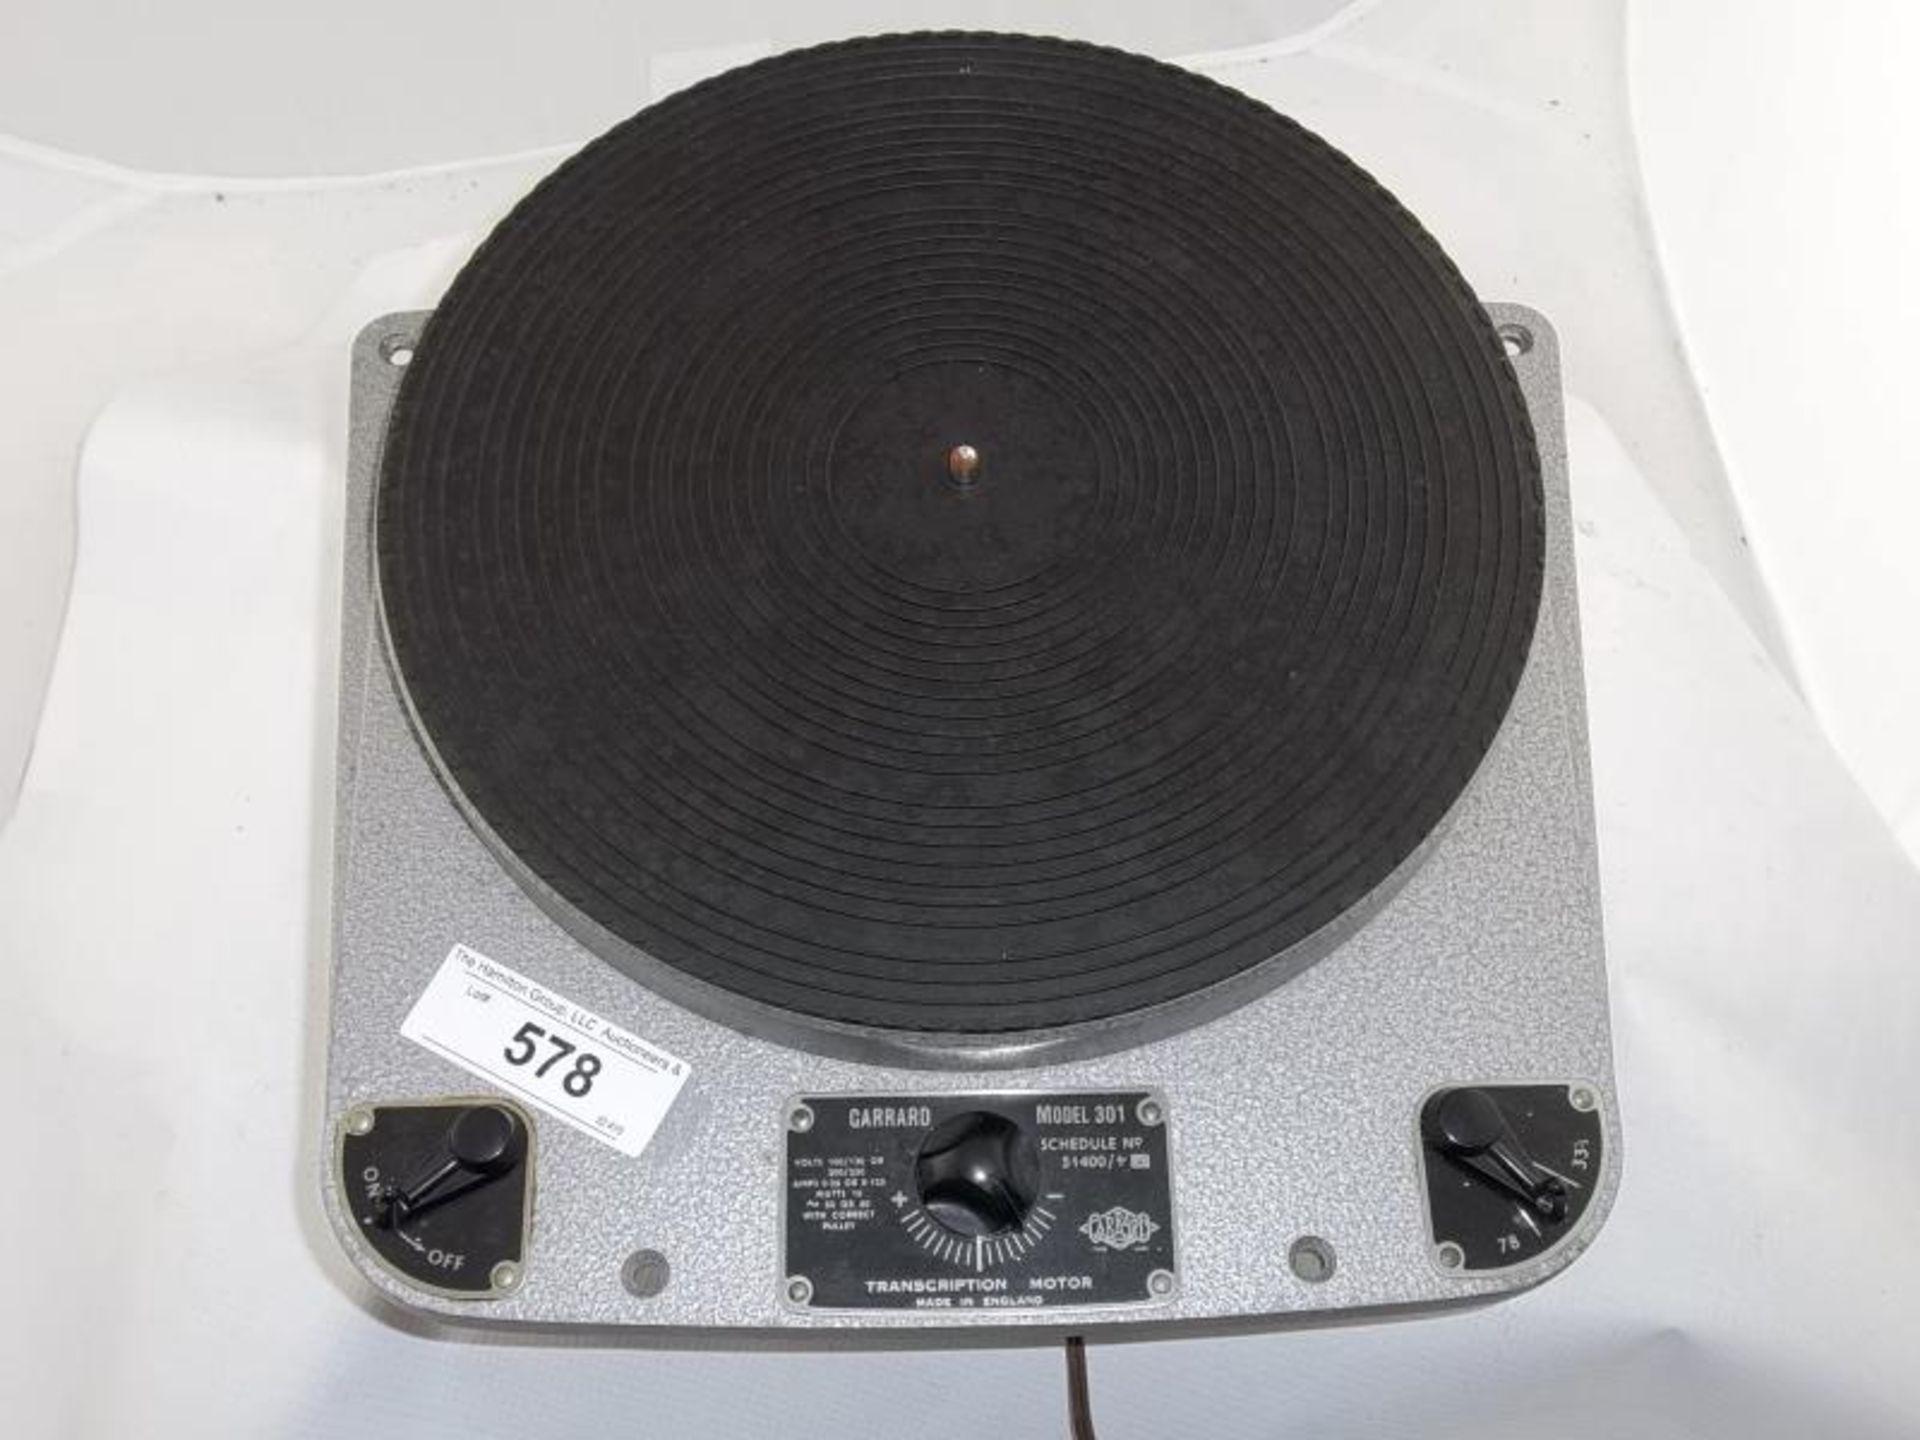 Lot 578 - Garrard model 301 turntable, made in England, schedule 51400/2, no base, no arm, transcription